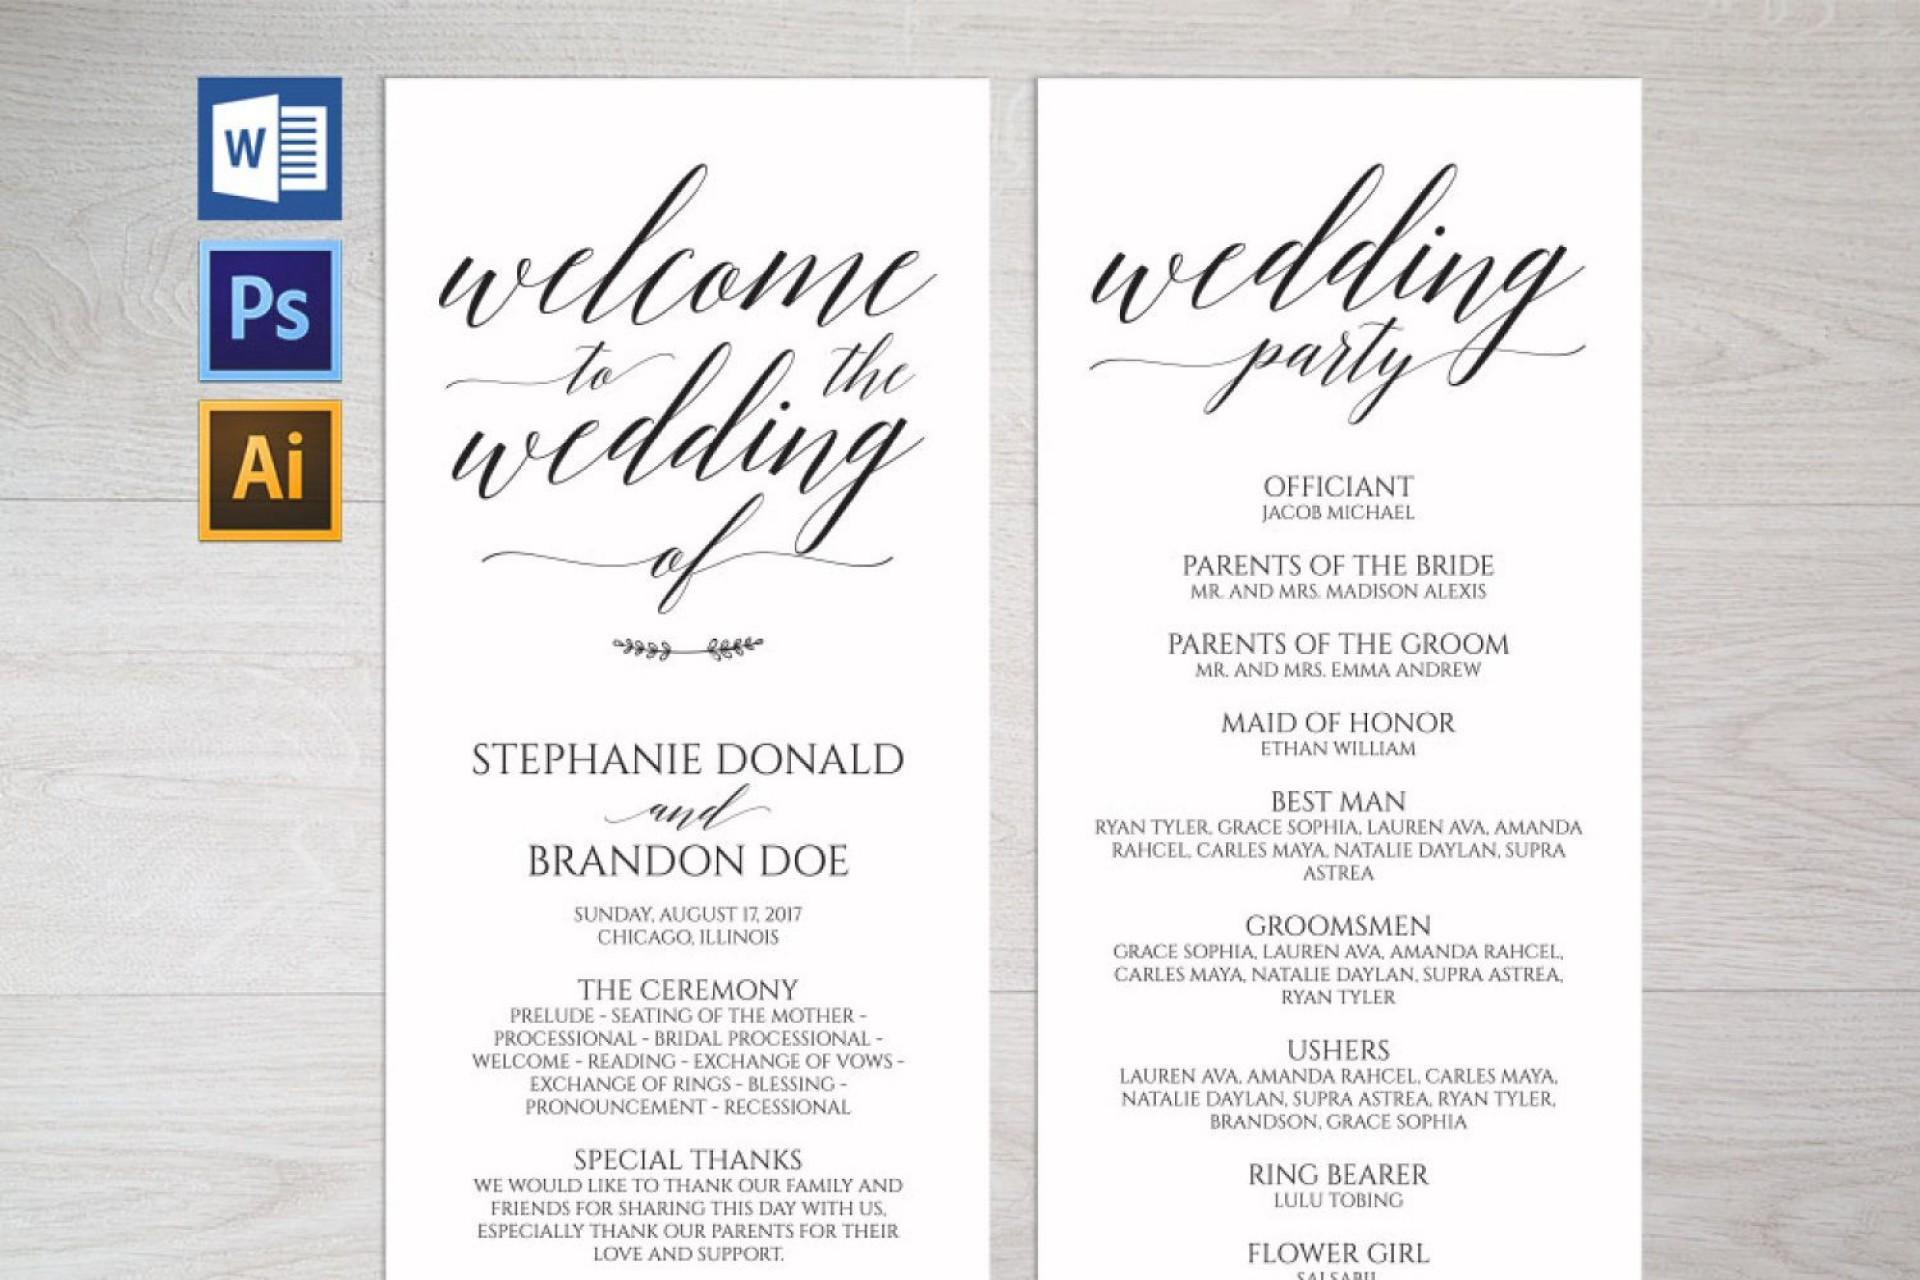 005 Unusual Wedding Program Template Free High Def  Fan Download Elegant1920